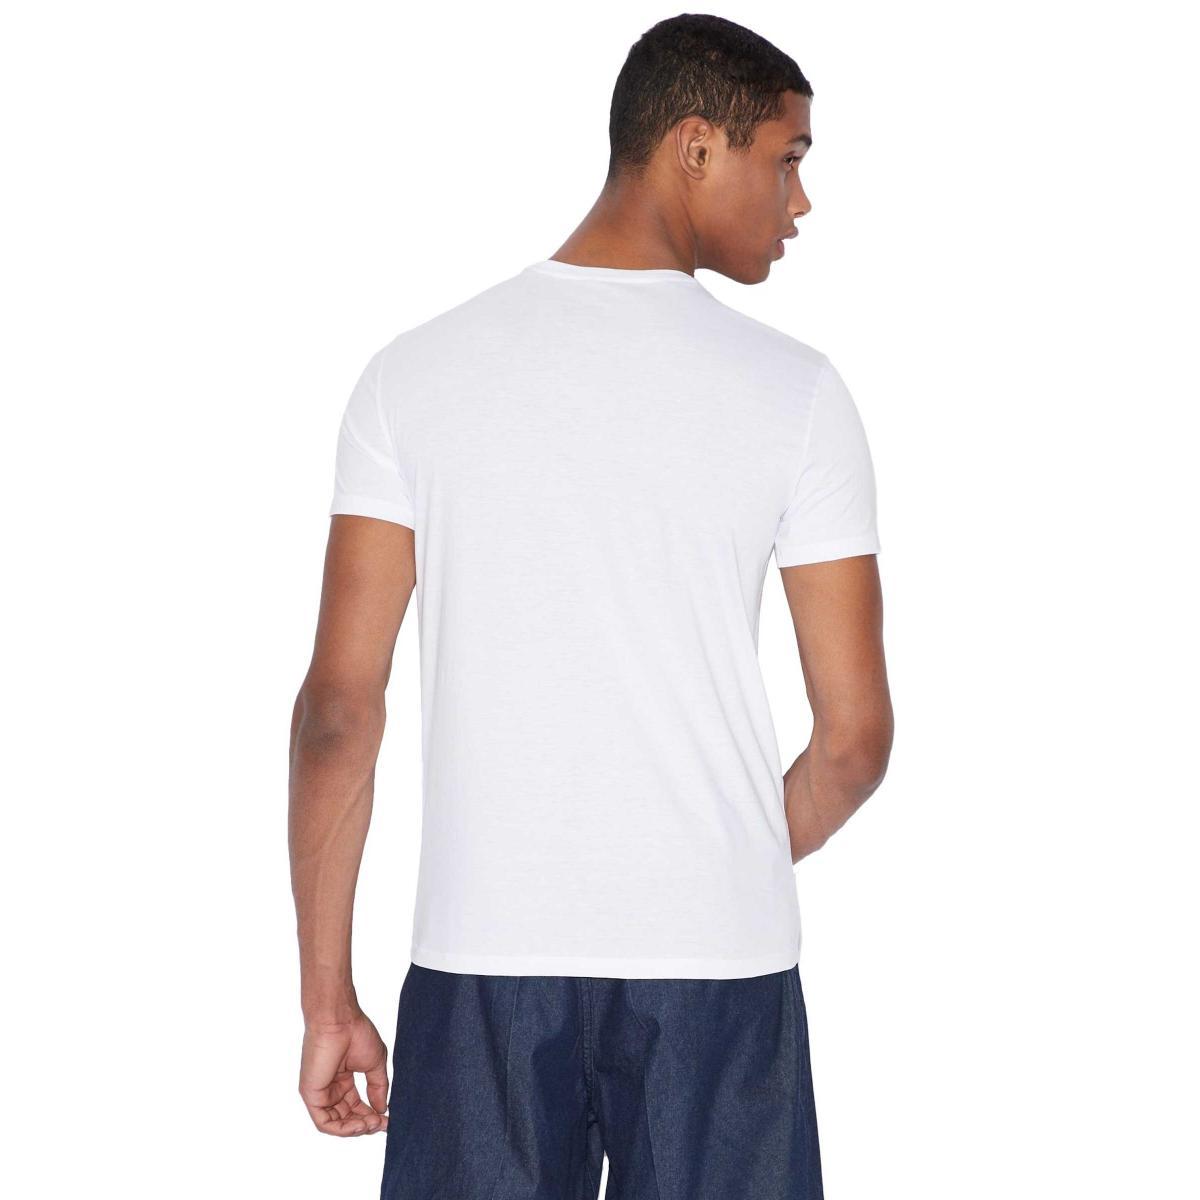 T-shirt Armani Exchange con stampa fotografica da uomo rif. 3GZTGY ZJA5Z